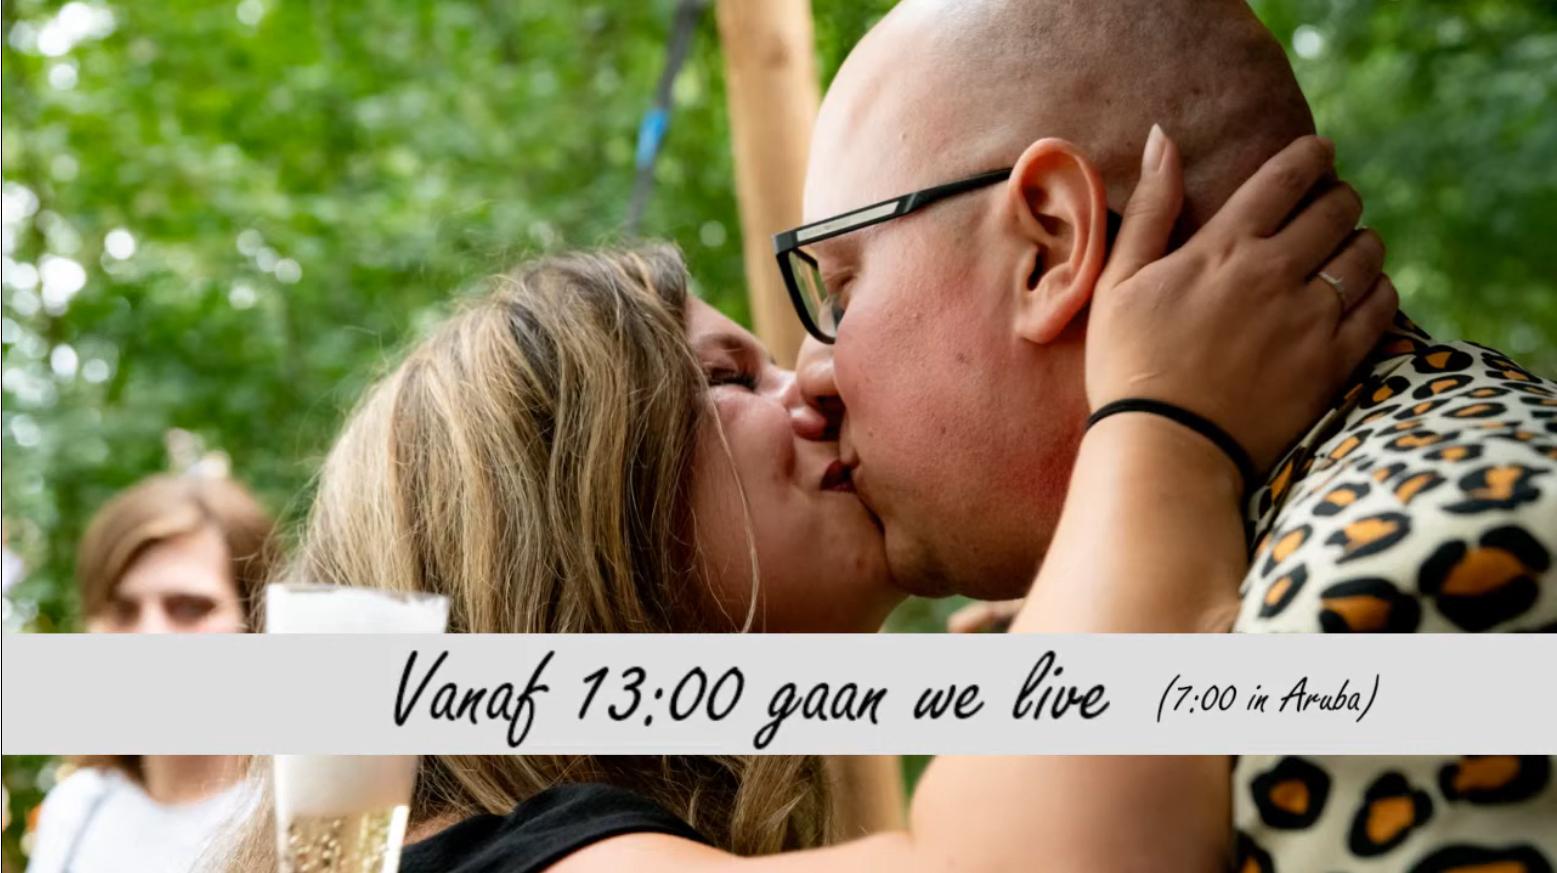 Je bruiloft livestreamen: zo doe je het zelf